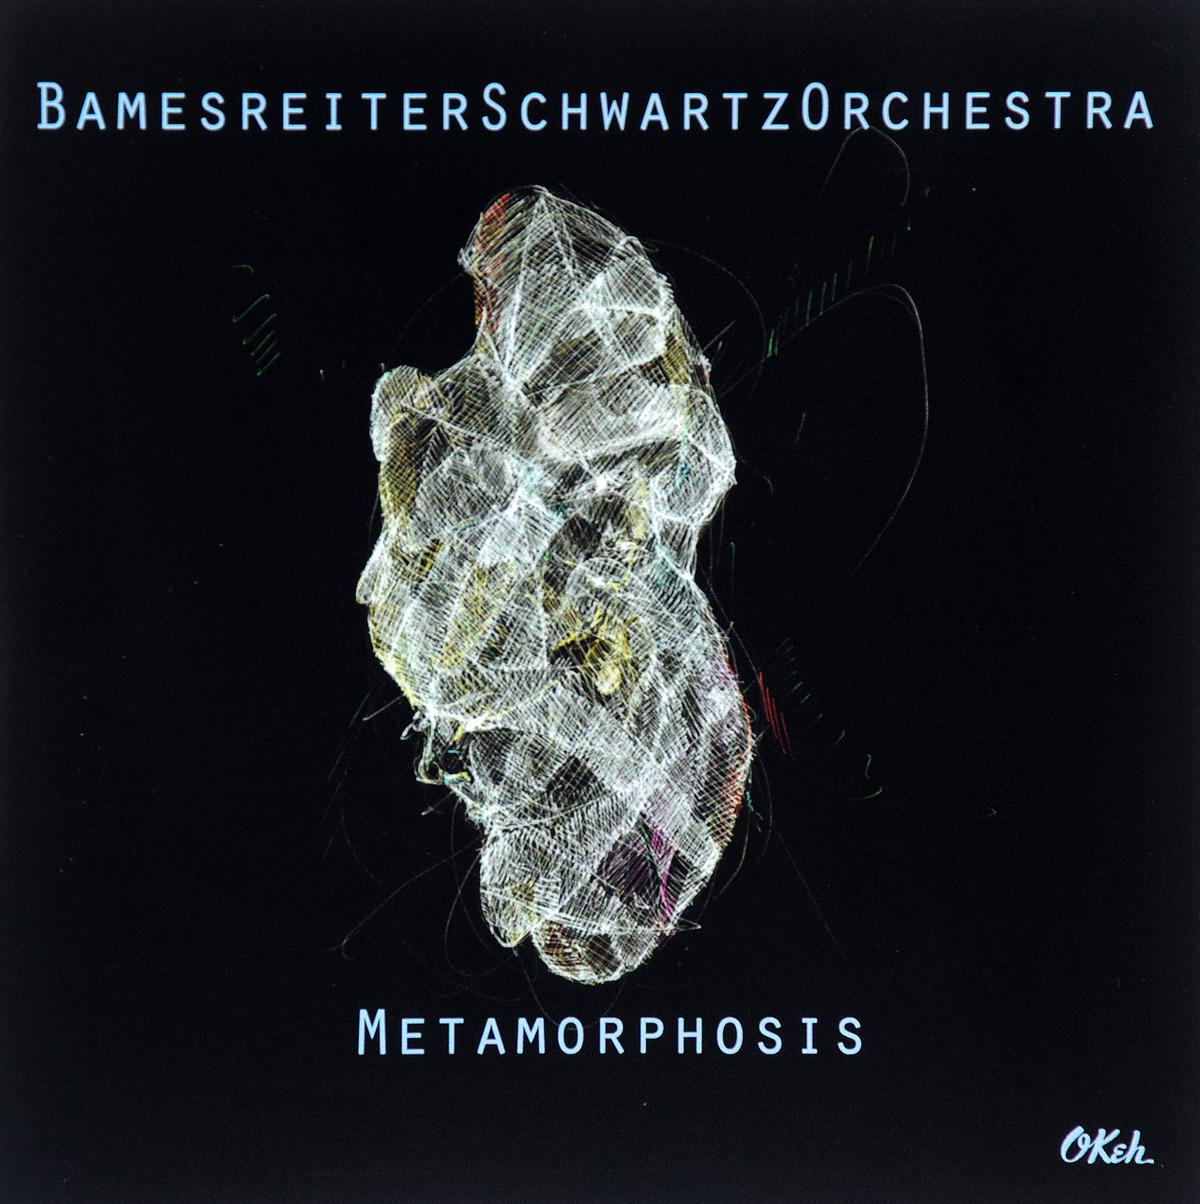 Bamesreiter Schwartz Orchestra Bamesreiter Schwartz Orchestra. Metamorphosis marian d schwartz sara barefield